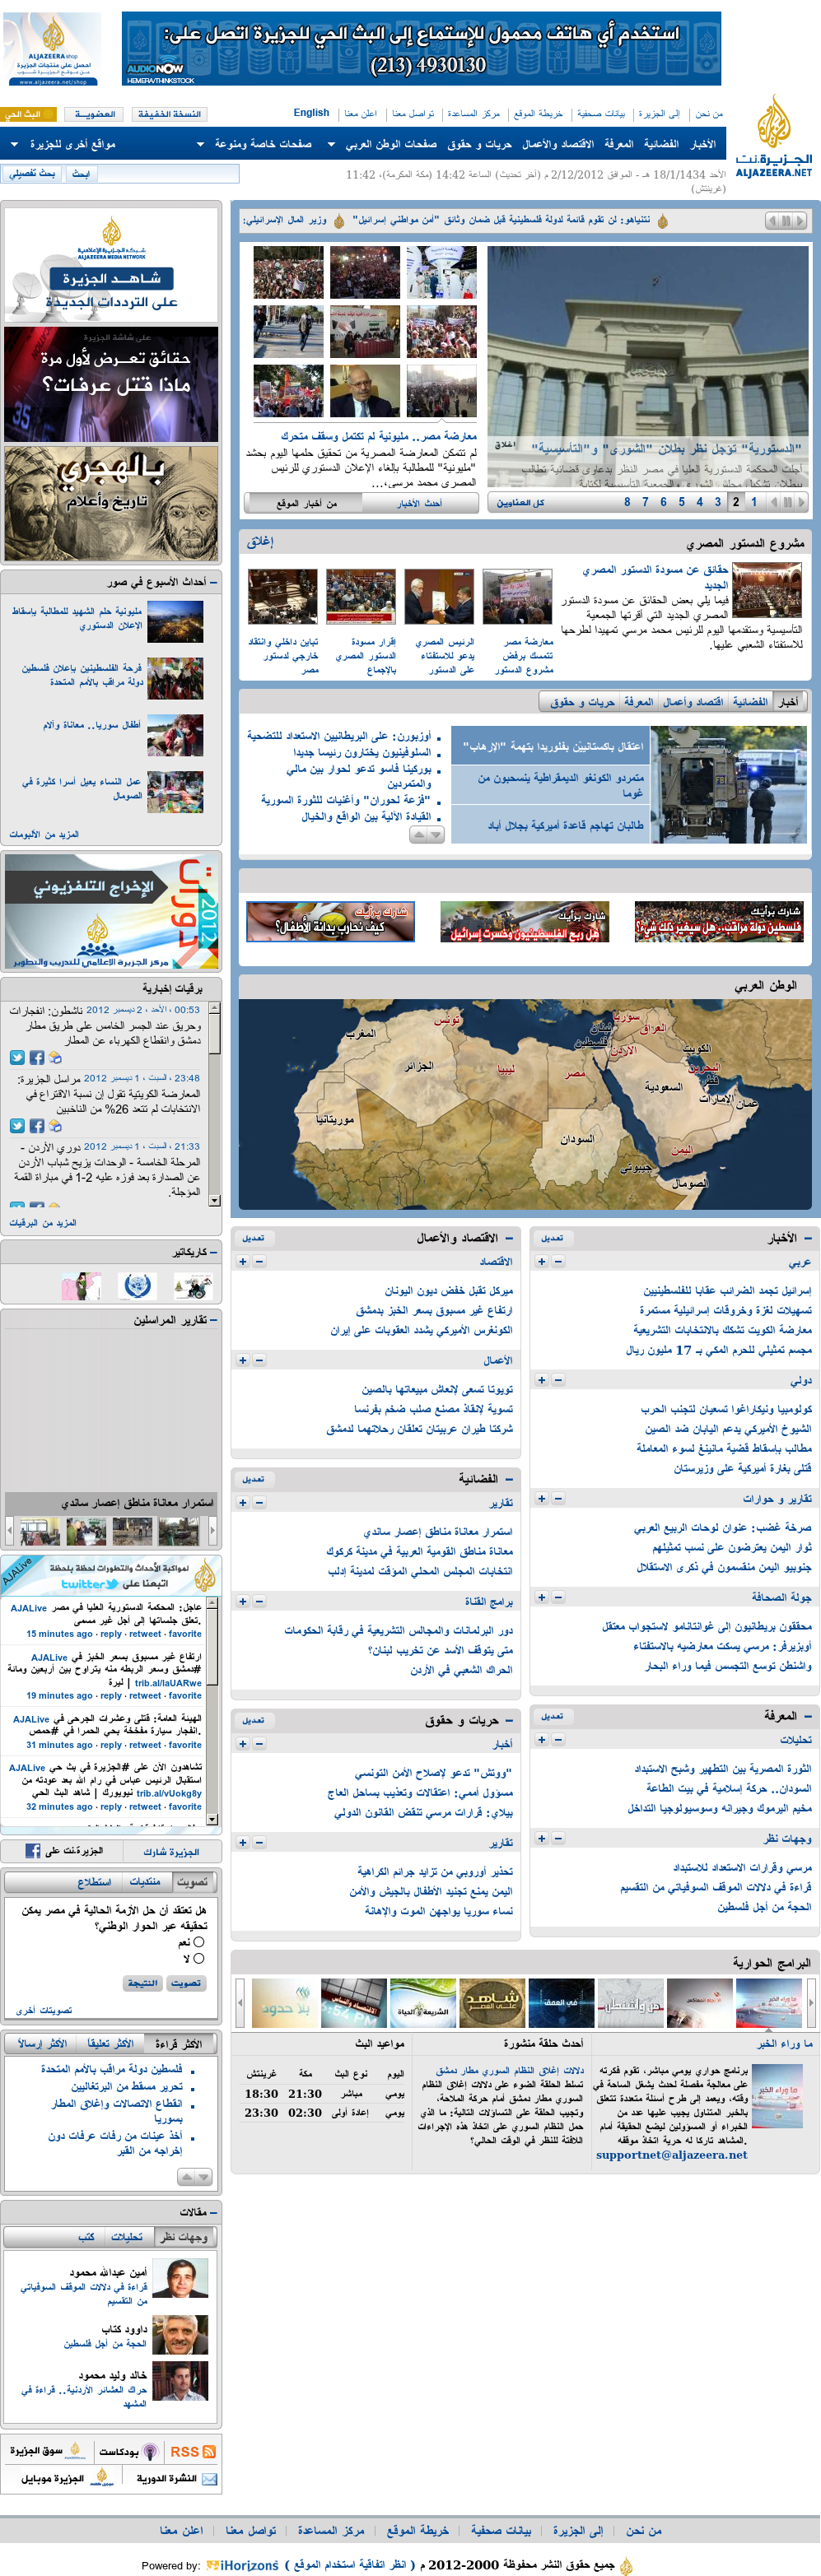 Al Jazeera at Sunday Dec. 2, 2012, 12:13 p.m. UTC